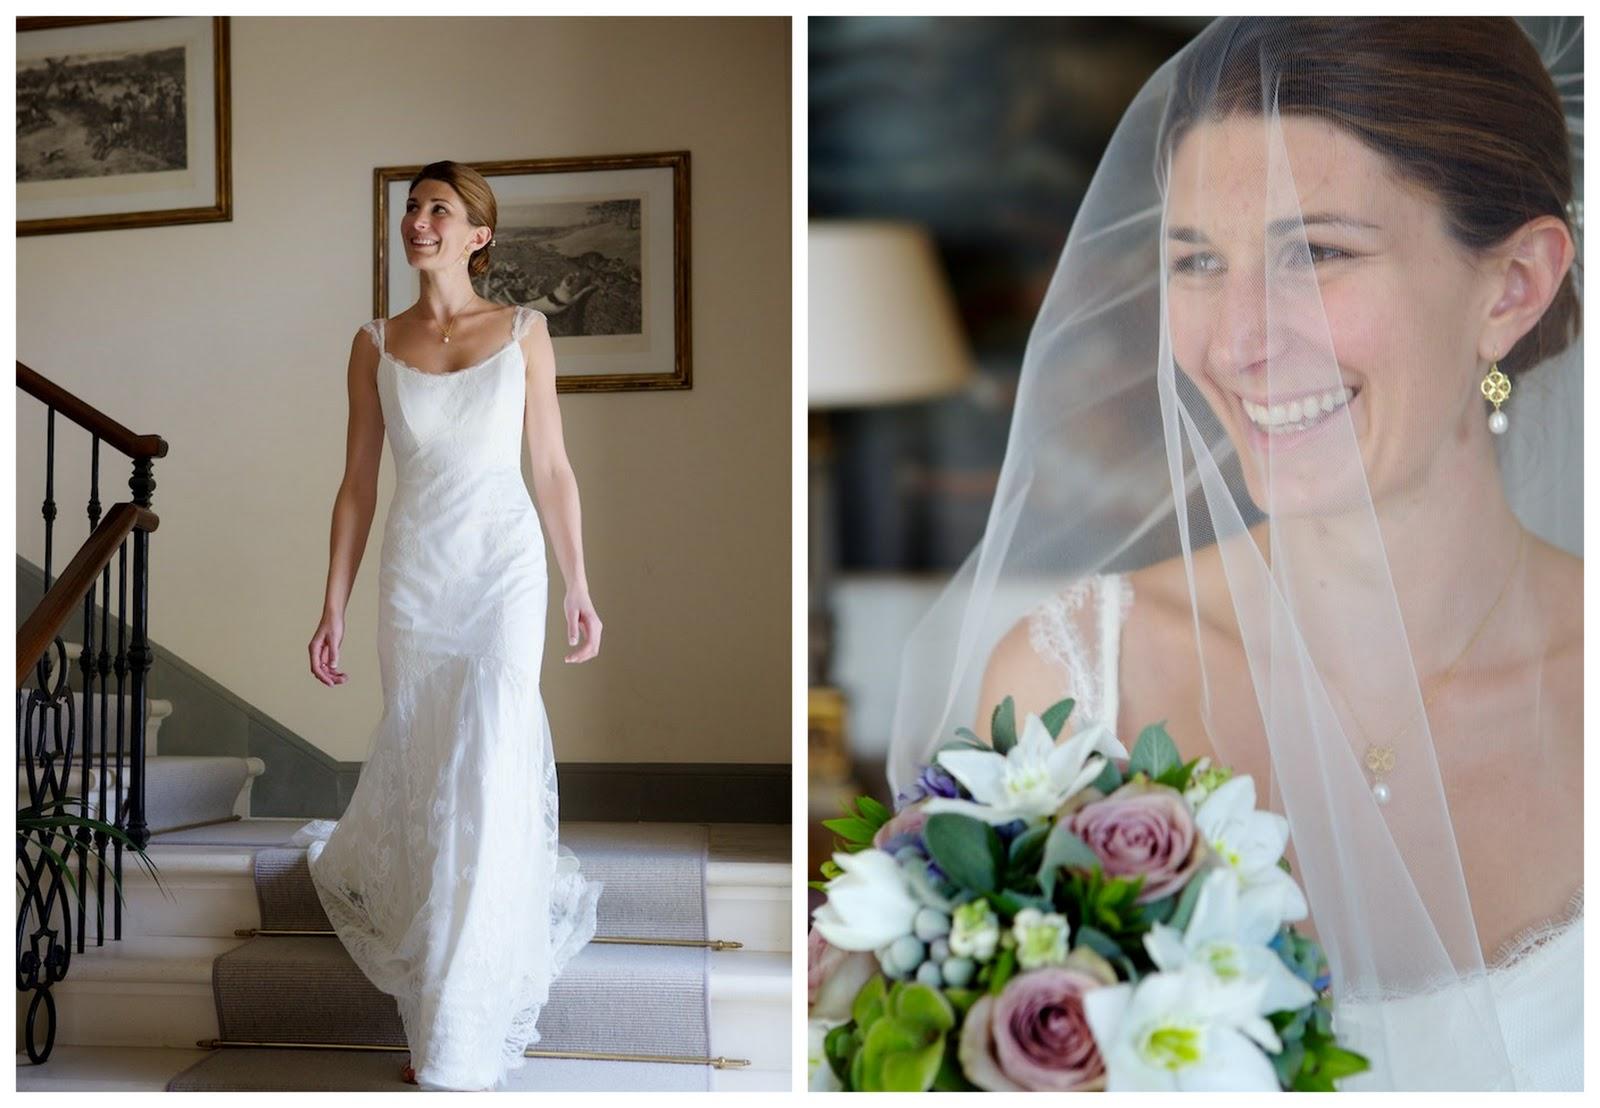 Real Destination Wedding: Laura & Chris {Part 2}